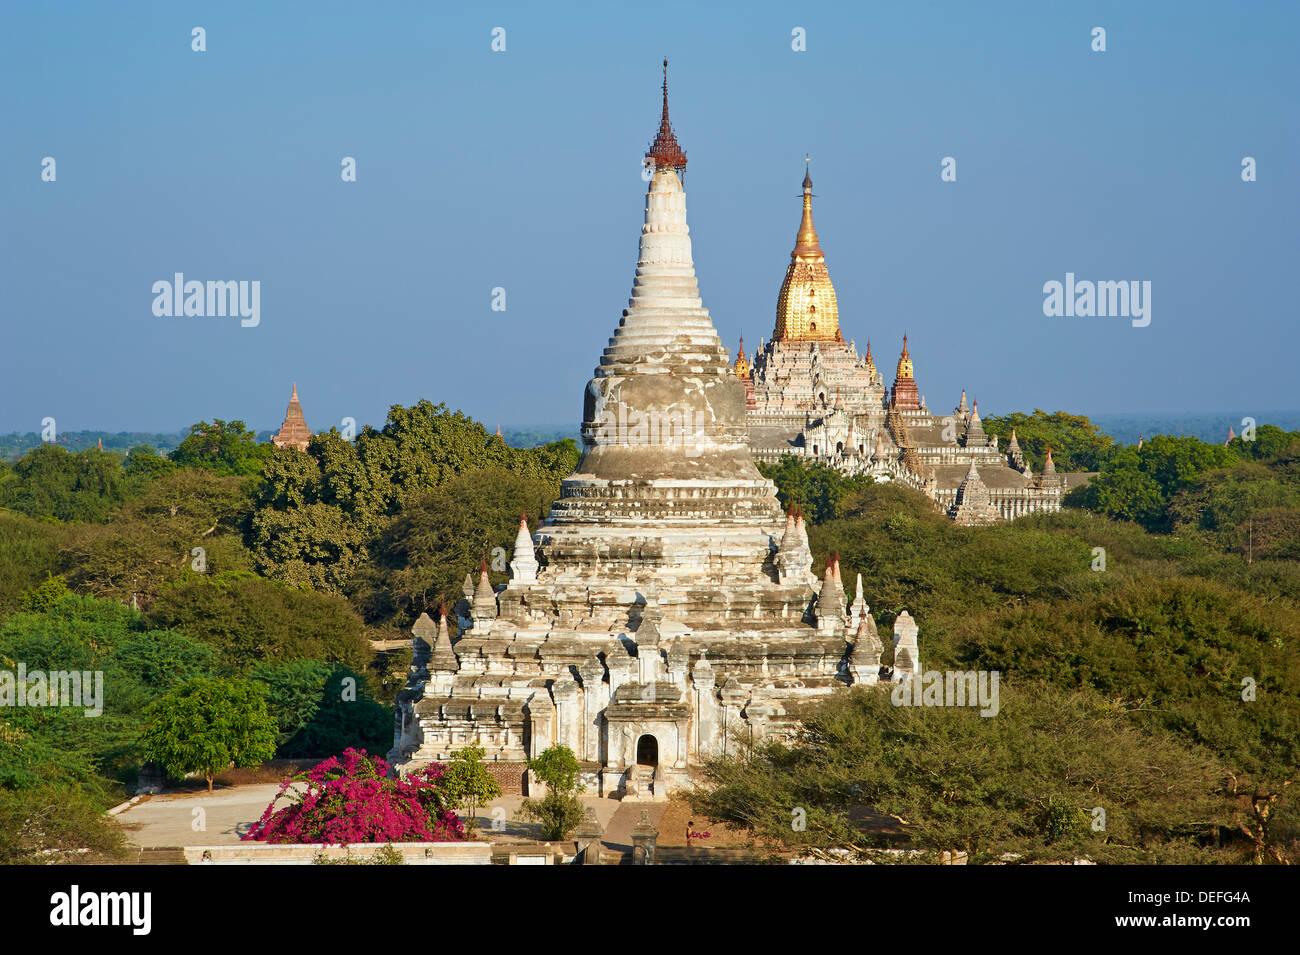 Bagan (Pagan), Myanmar (Burma), Asia - Stock Image